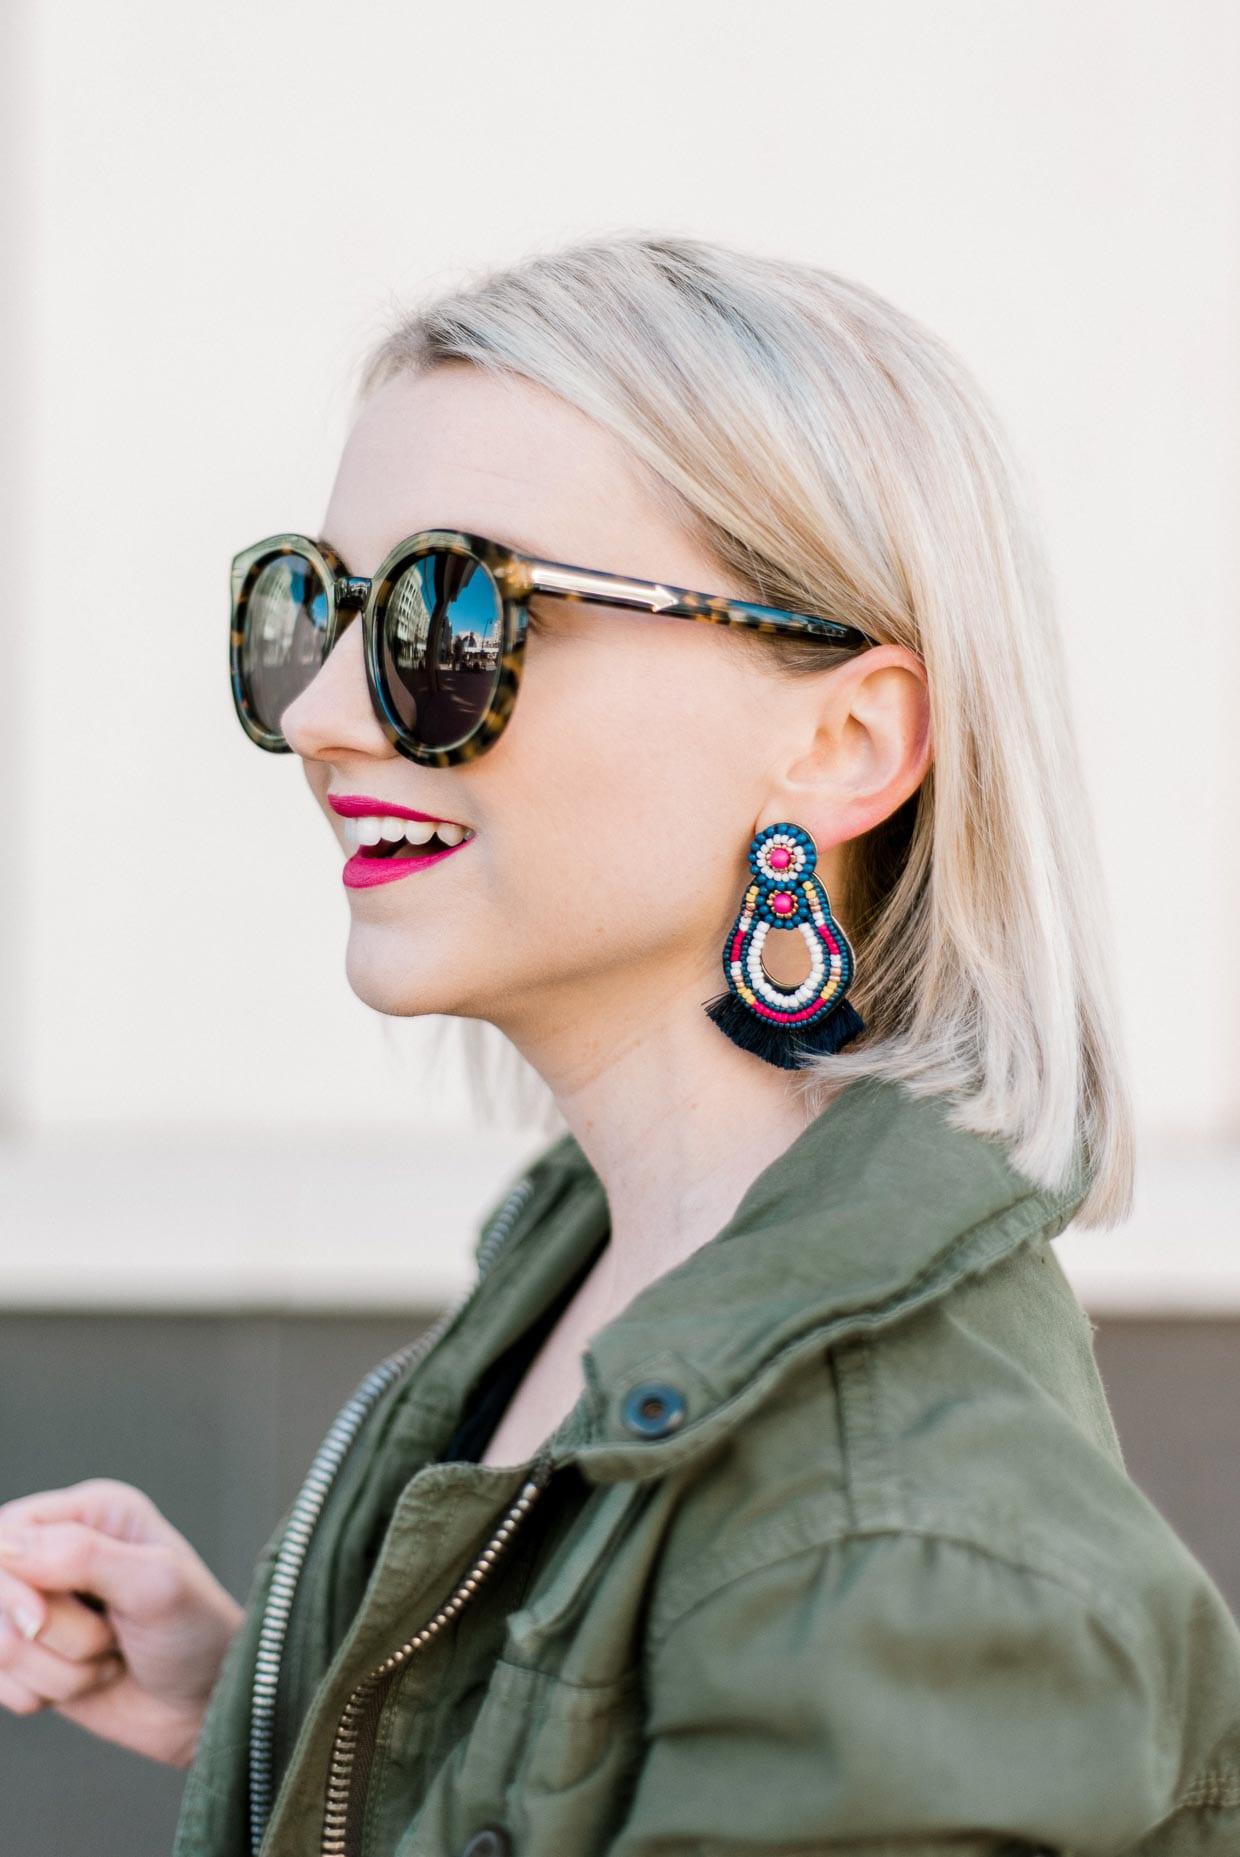 515d3562e The Best Statement Earrings For Spring - Poor Little It Girl